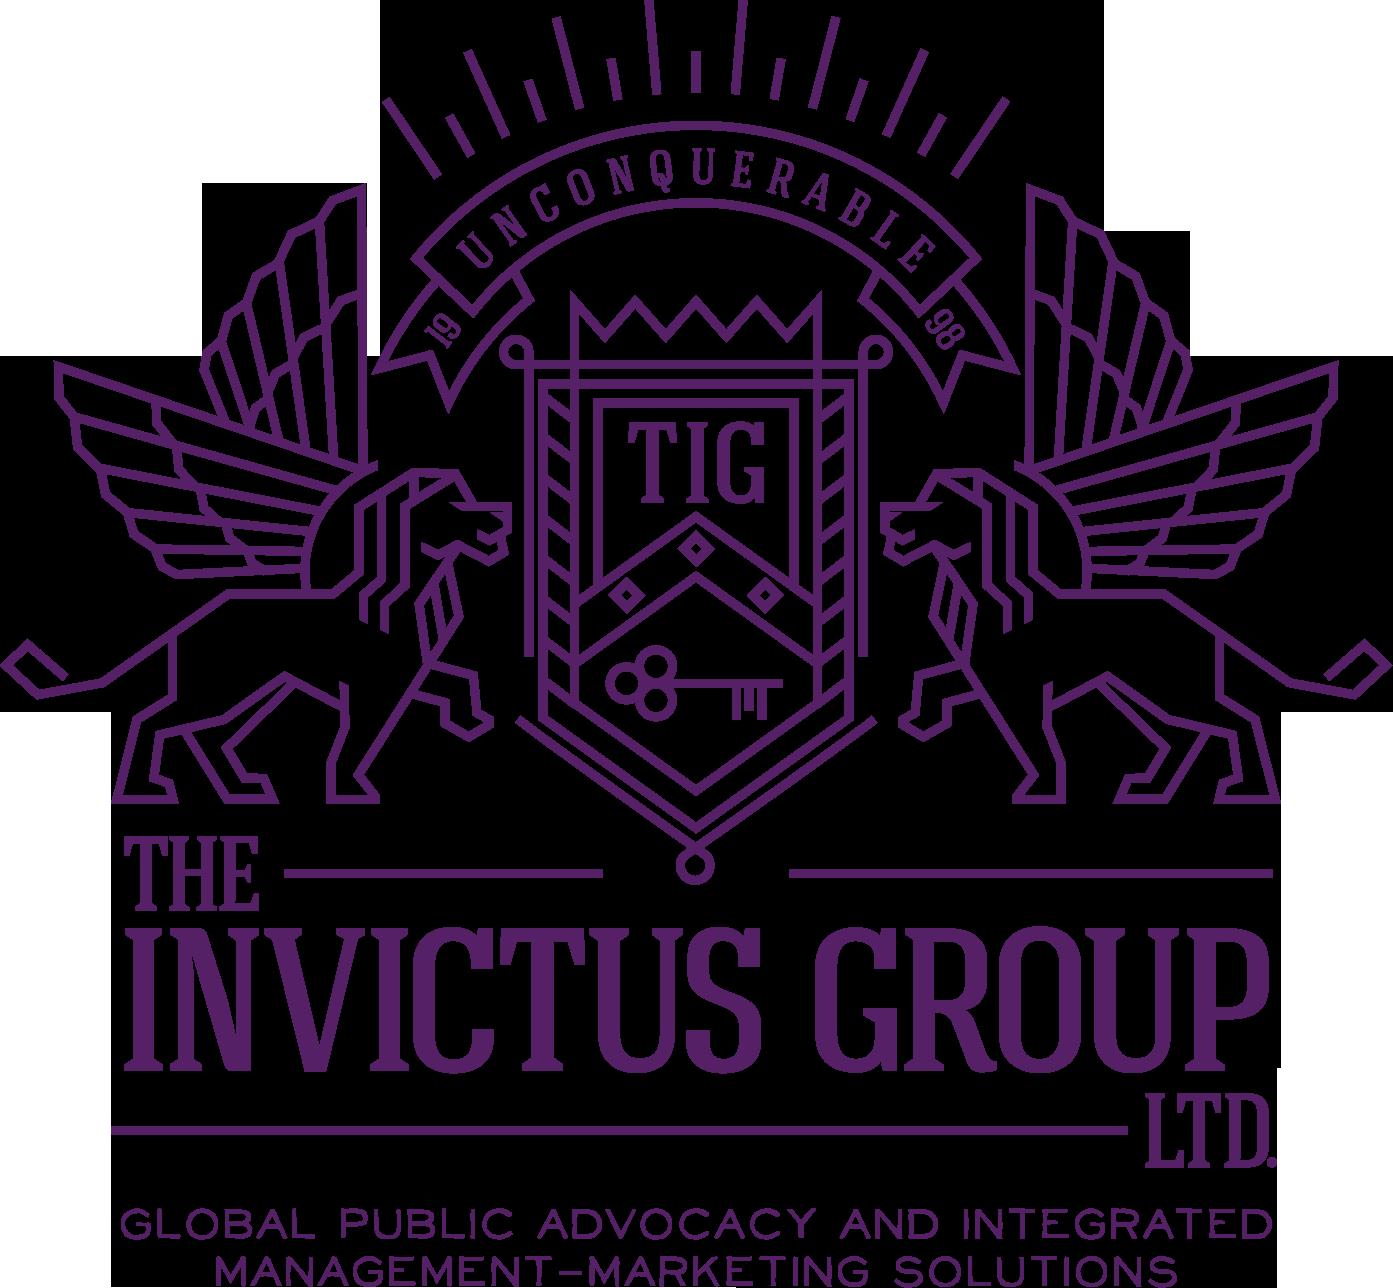 The Invictus Group Ltd.